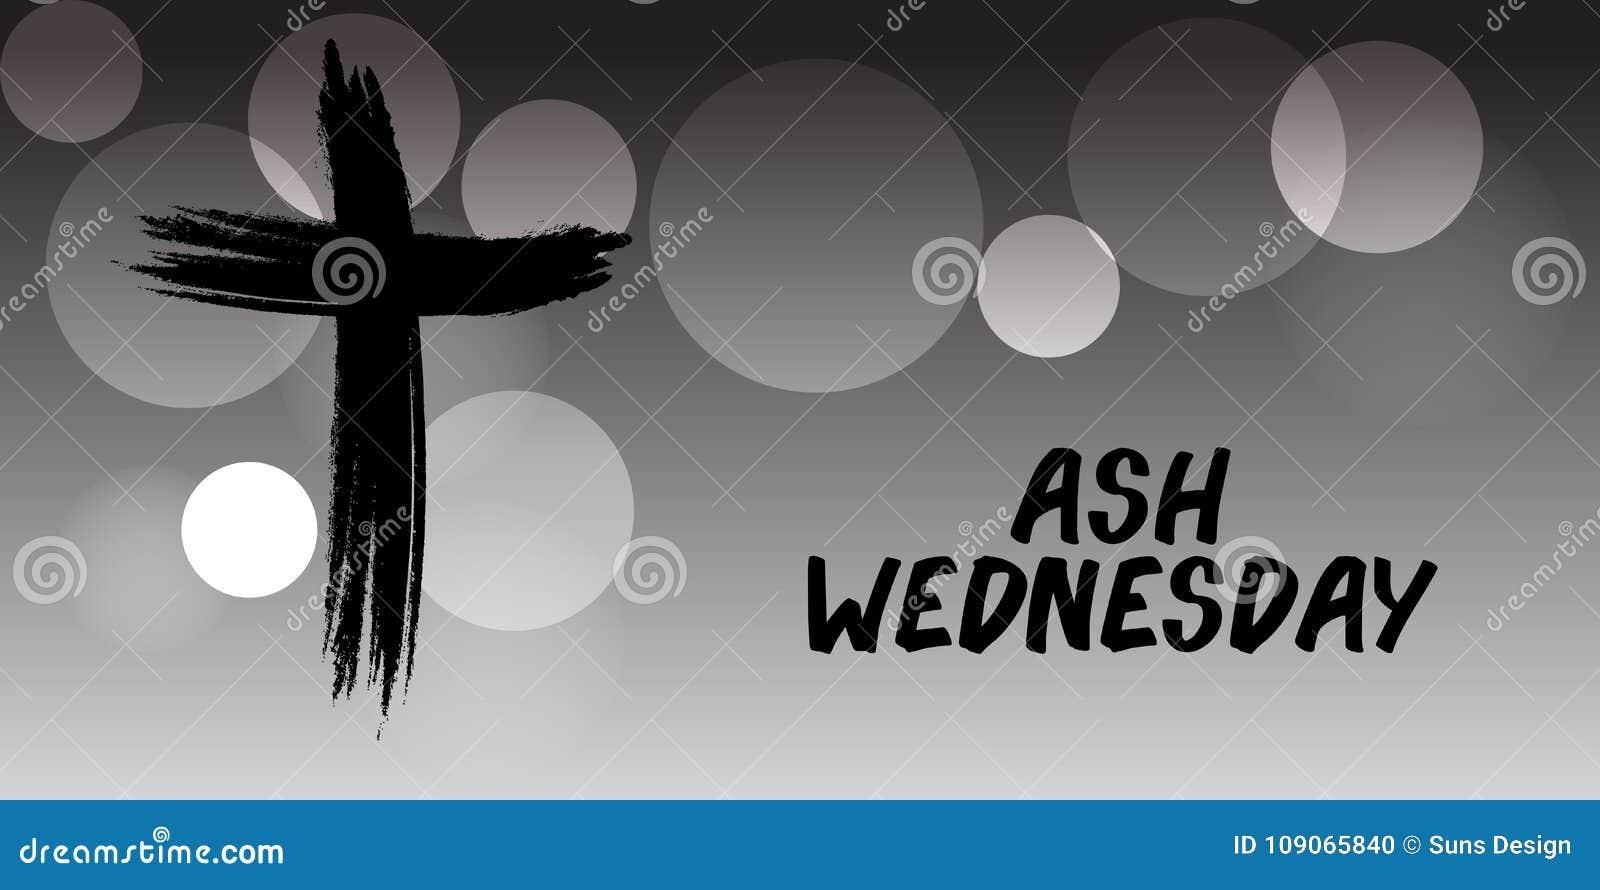 Ash wednesday stock illustration illustration of sign 109065840 ash wednesday buycottarizona Image collections